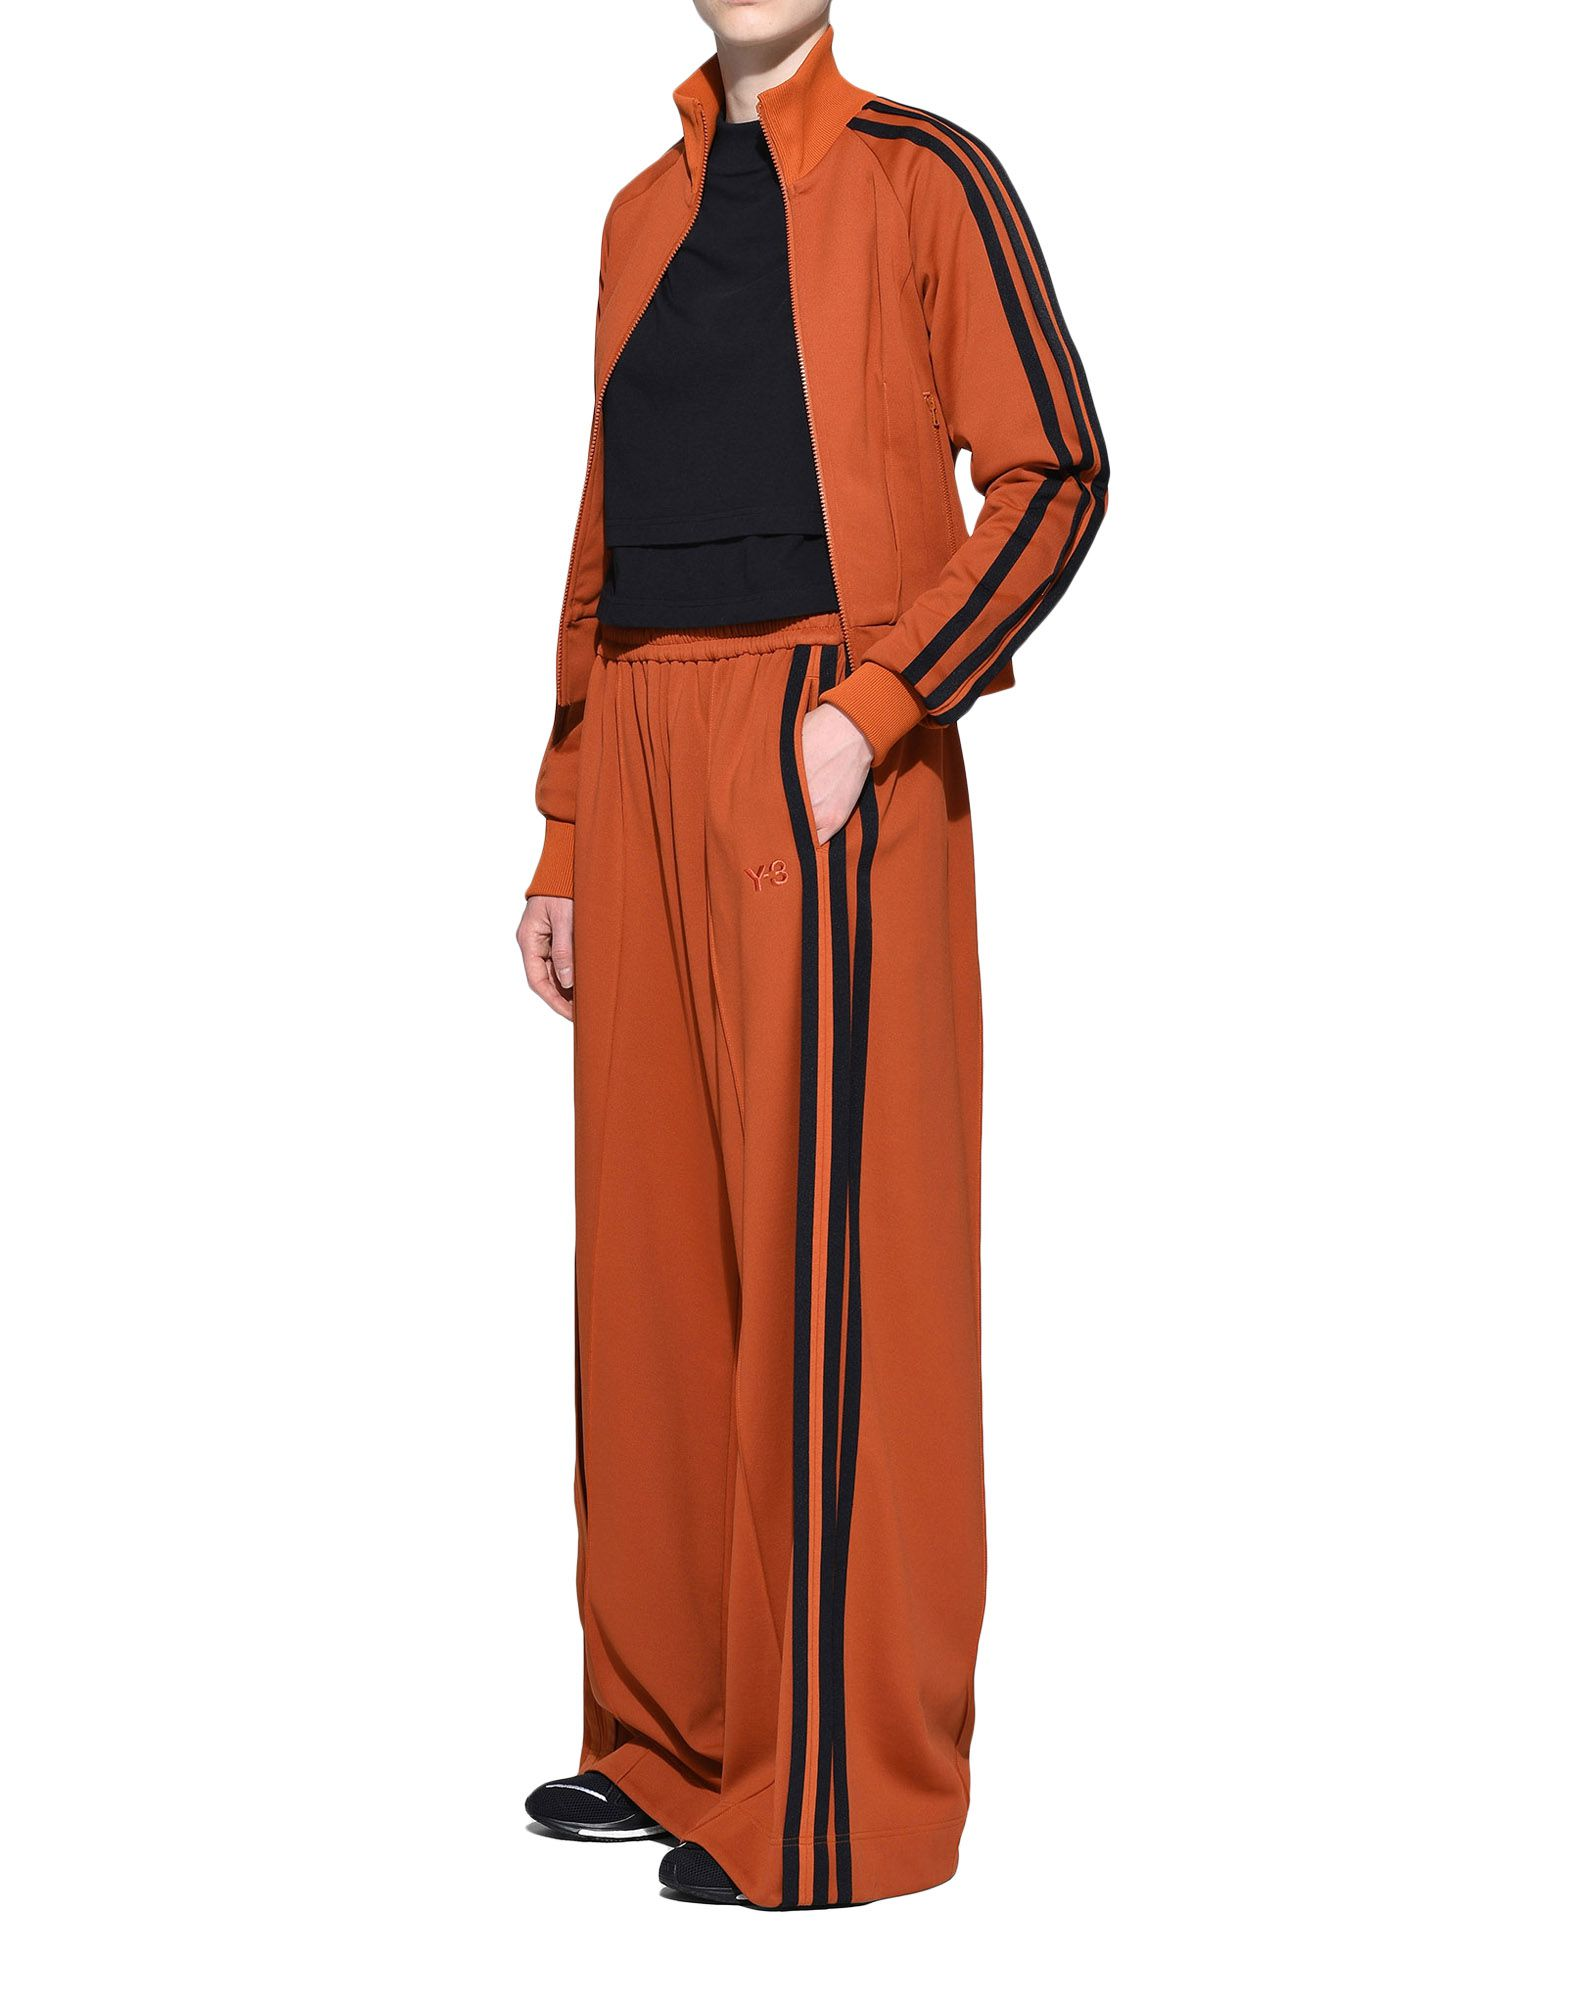 Y-3 Y-3 3-Stripes Selvedge Matte Track Pants Track pant Woman a